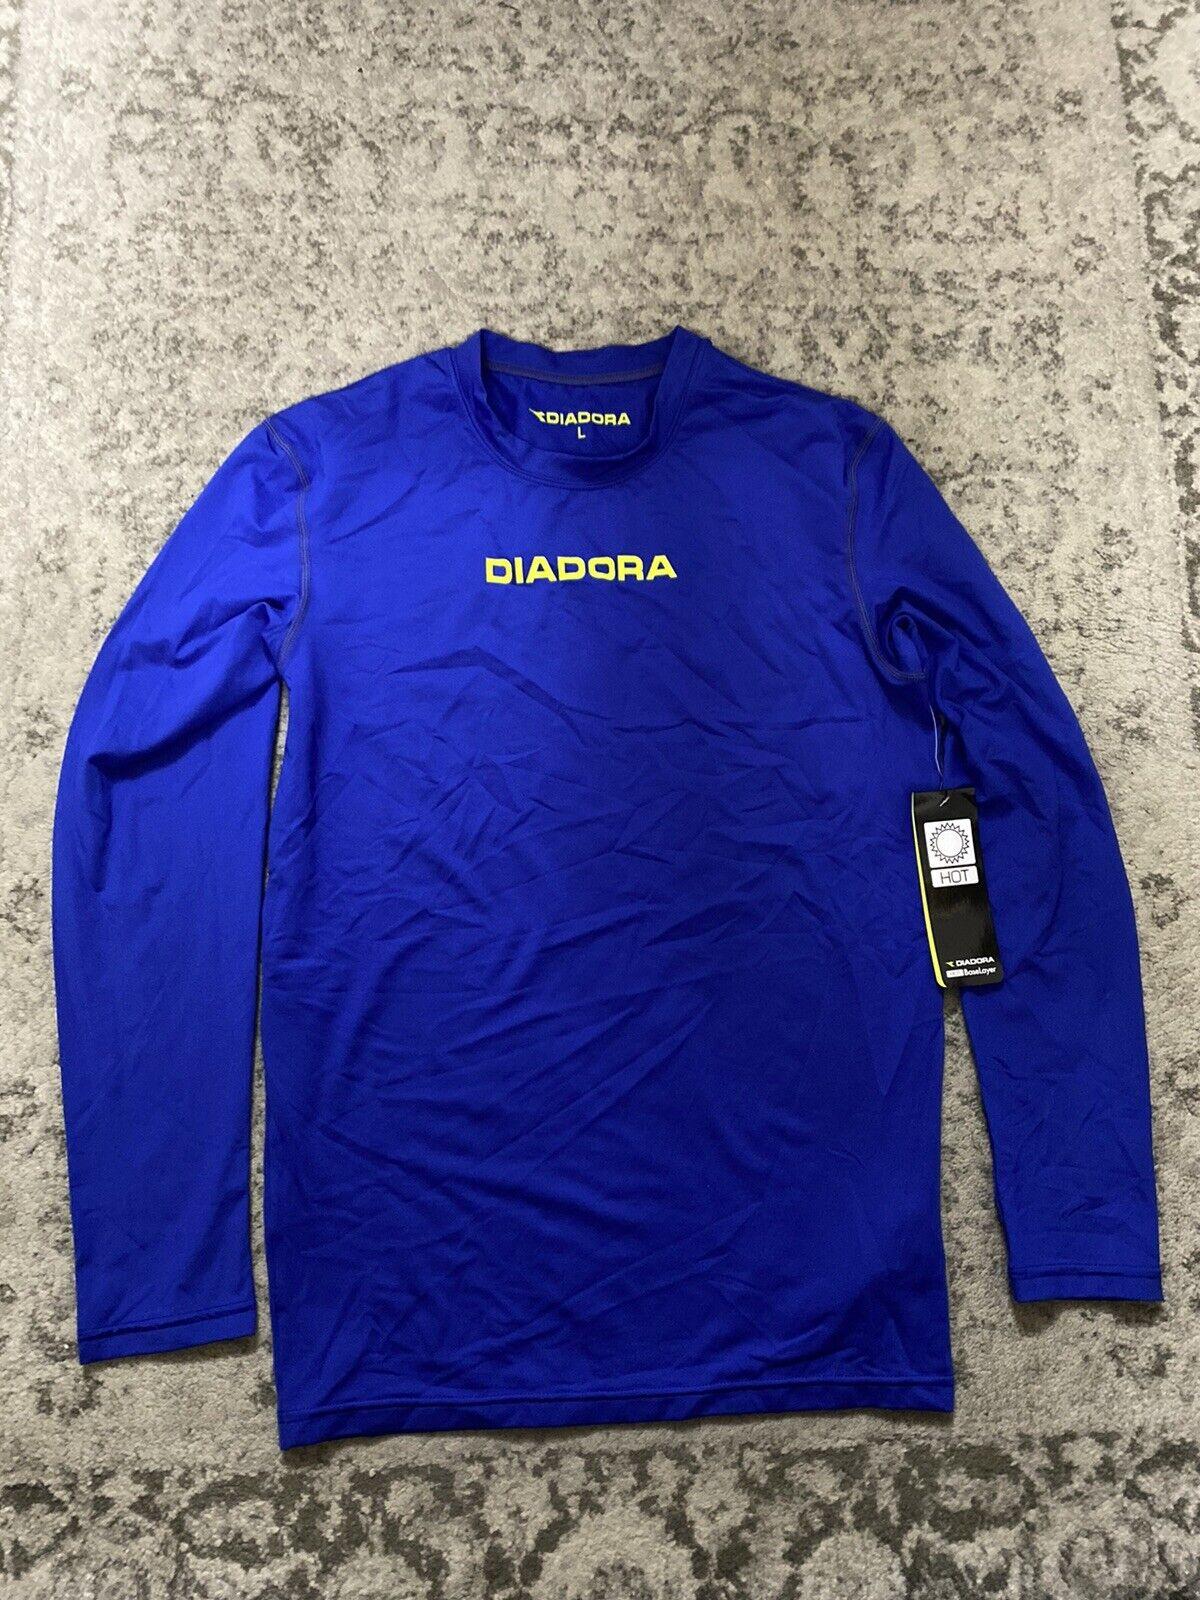 Diadora Hot Club Base Layer Blue Size Large Men's BNWT.